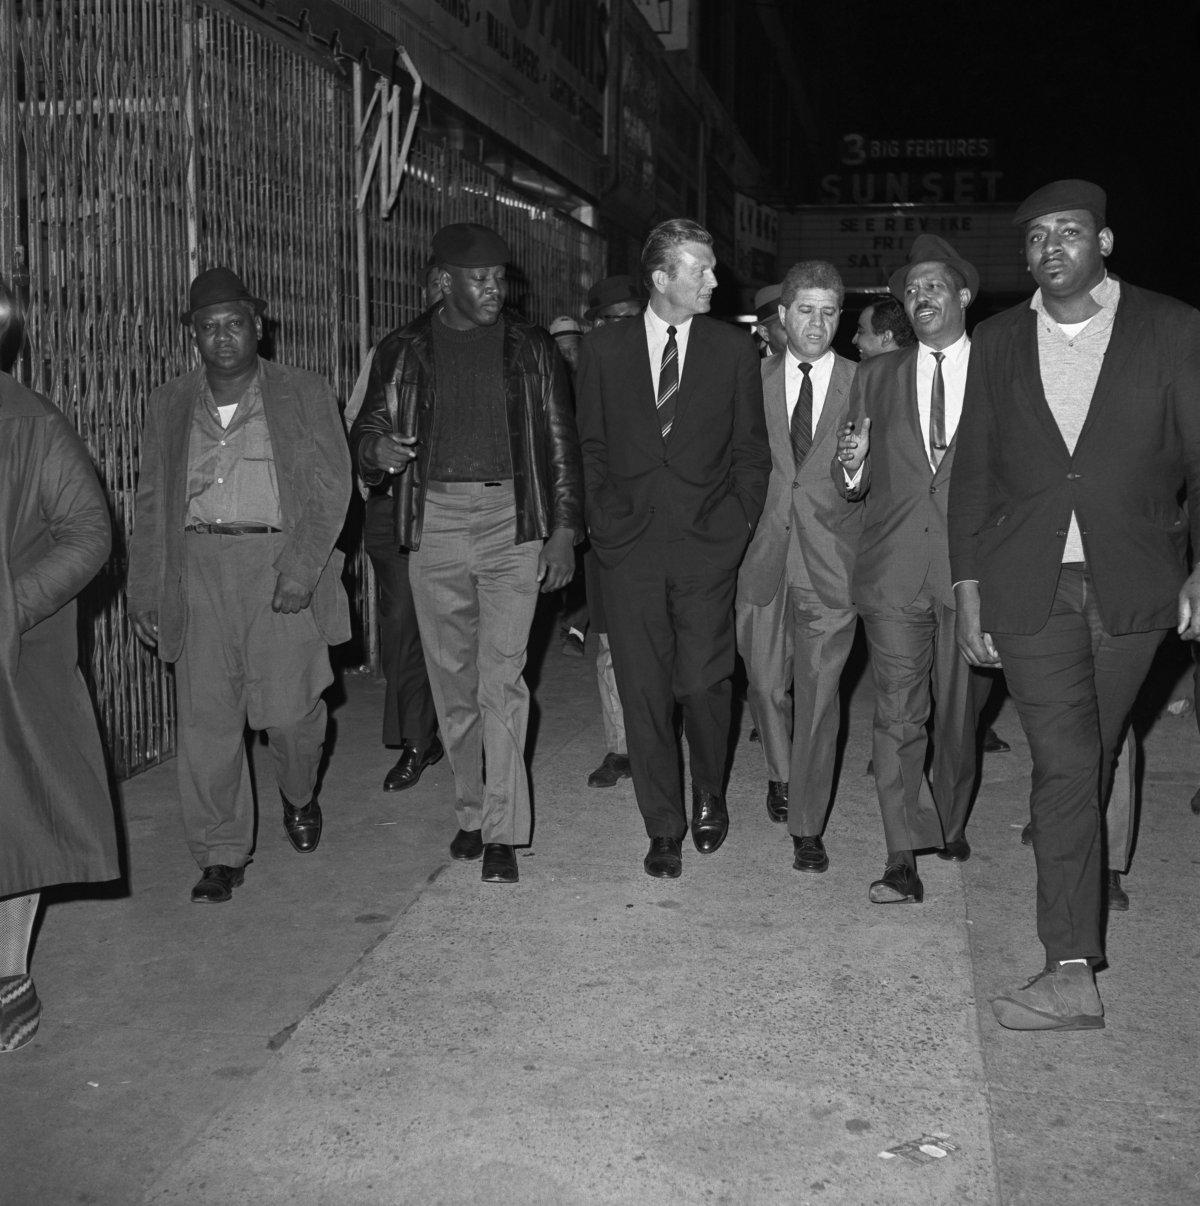 Mayor Lindsay walks through Harlem on the night of King's assassination.